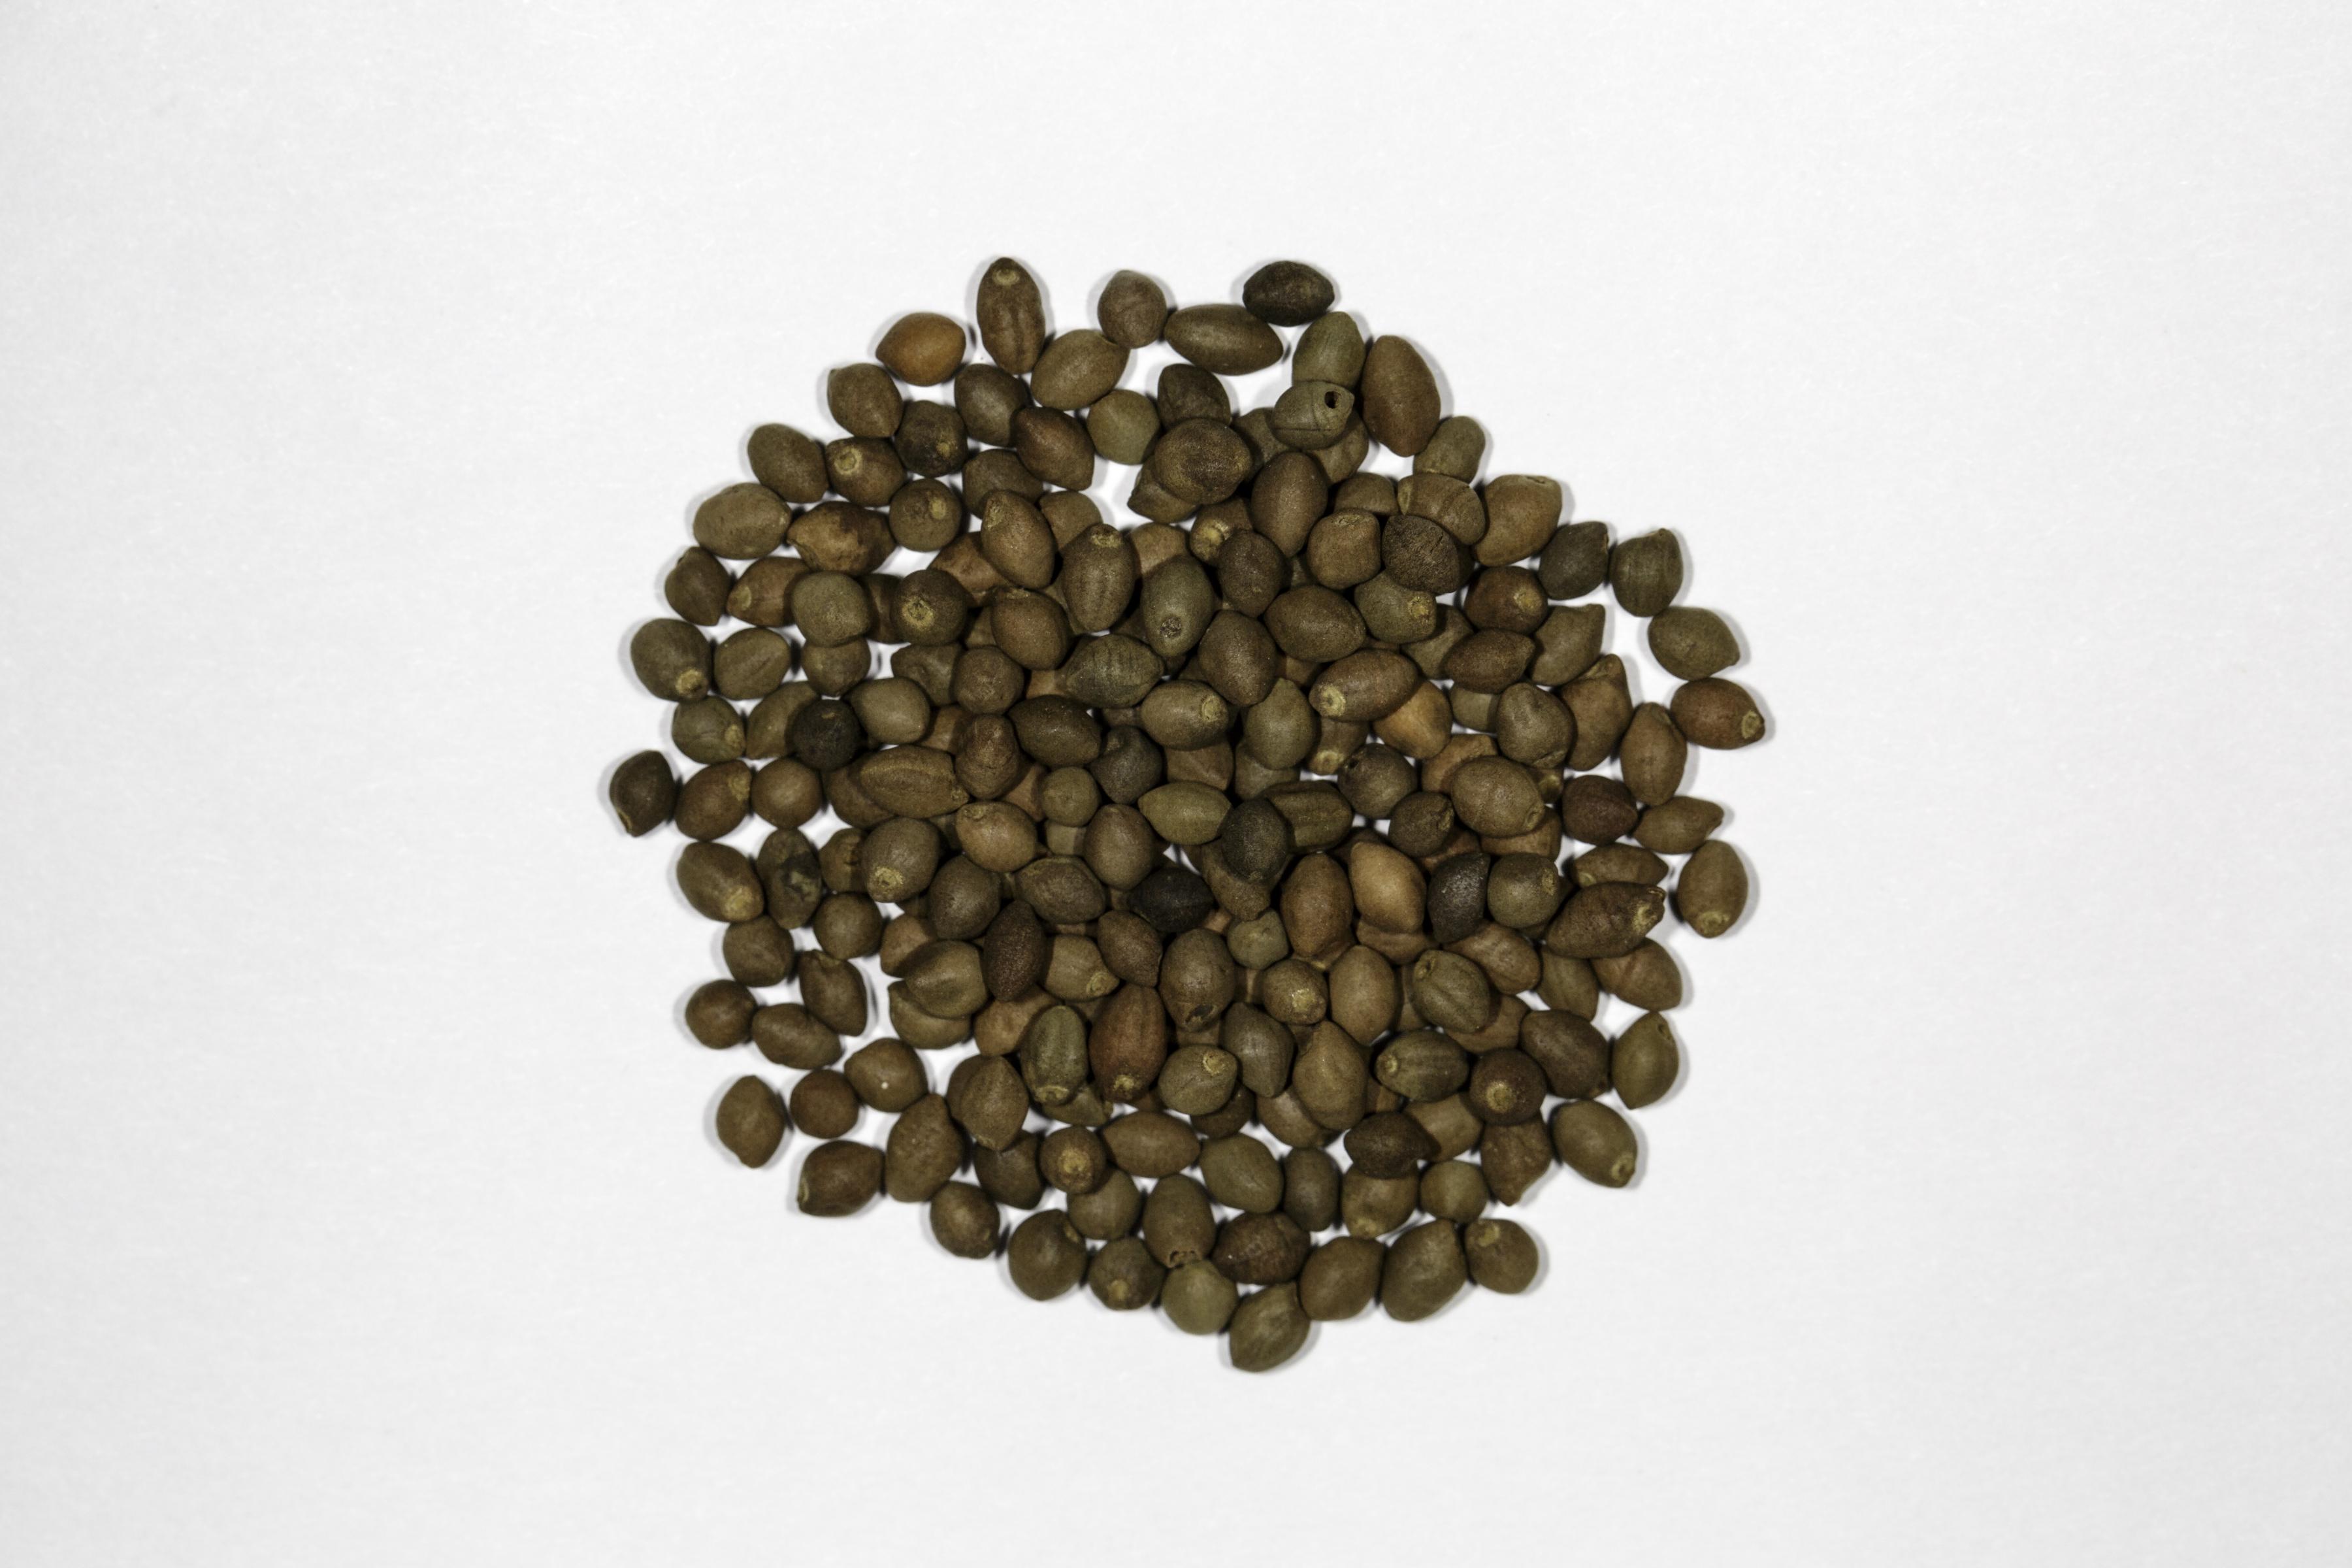 A top down view of a small pile of Rivea/Turbina corymbosa seeds.